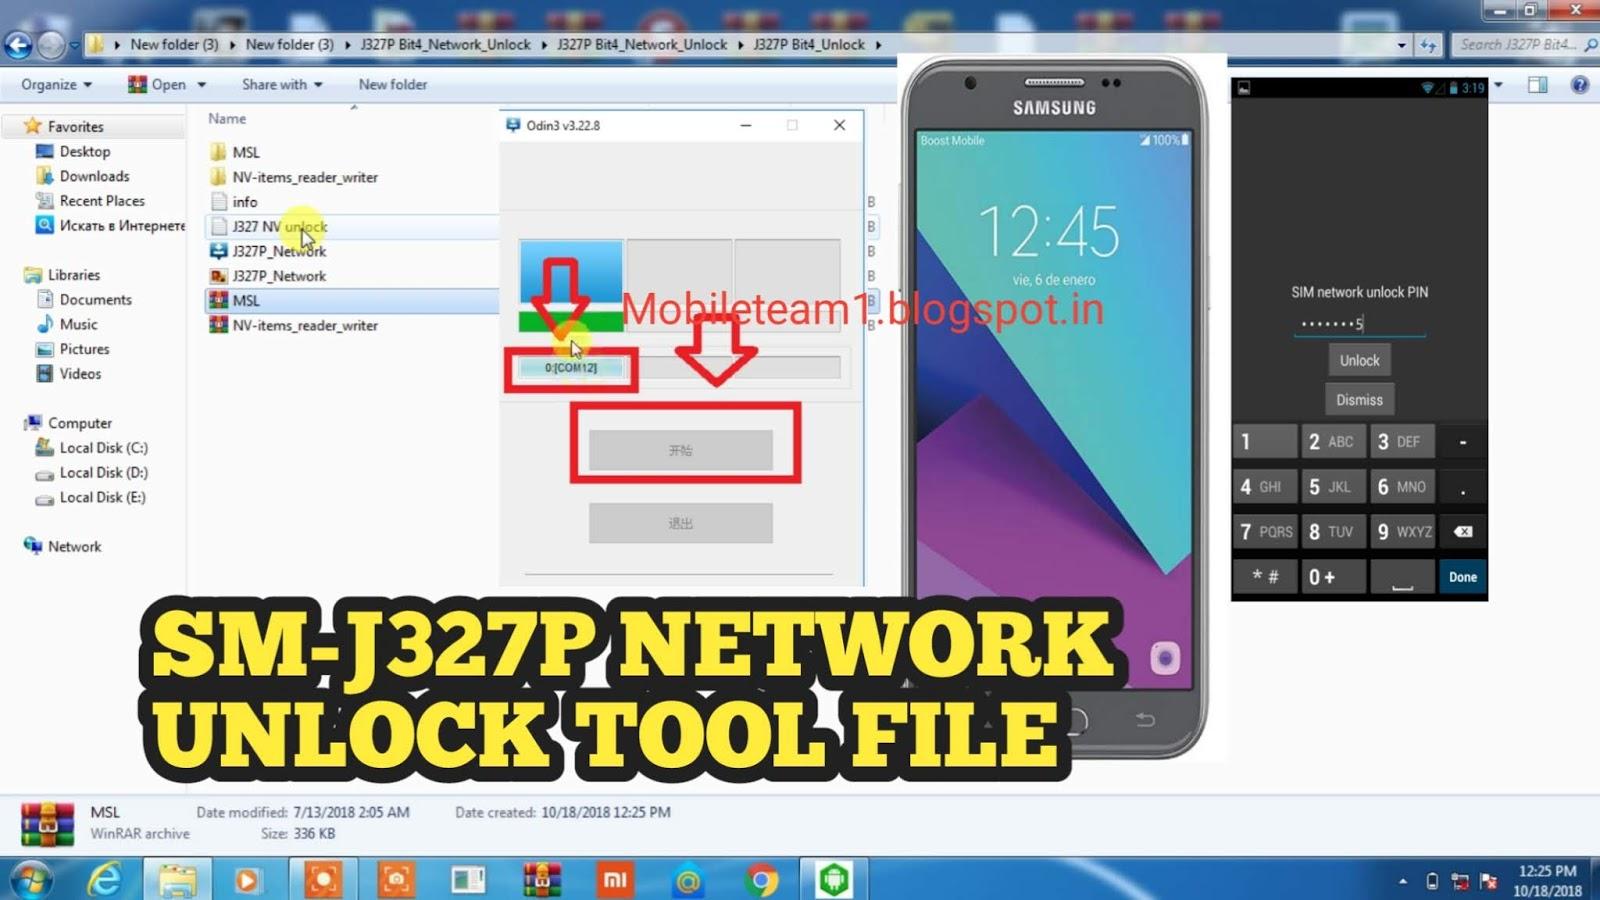 Mobileteam1: SM-J327P Samsung galaxy J3 Emerge NETWORK